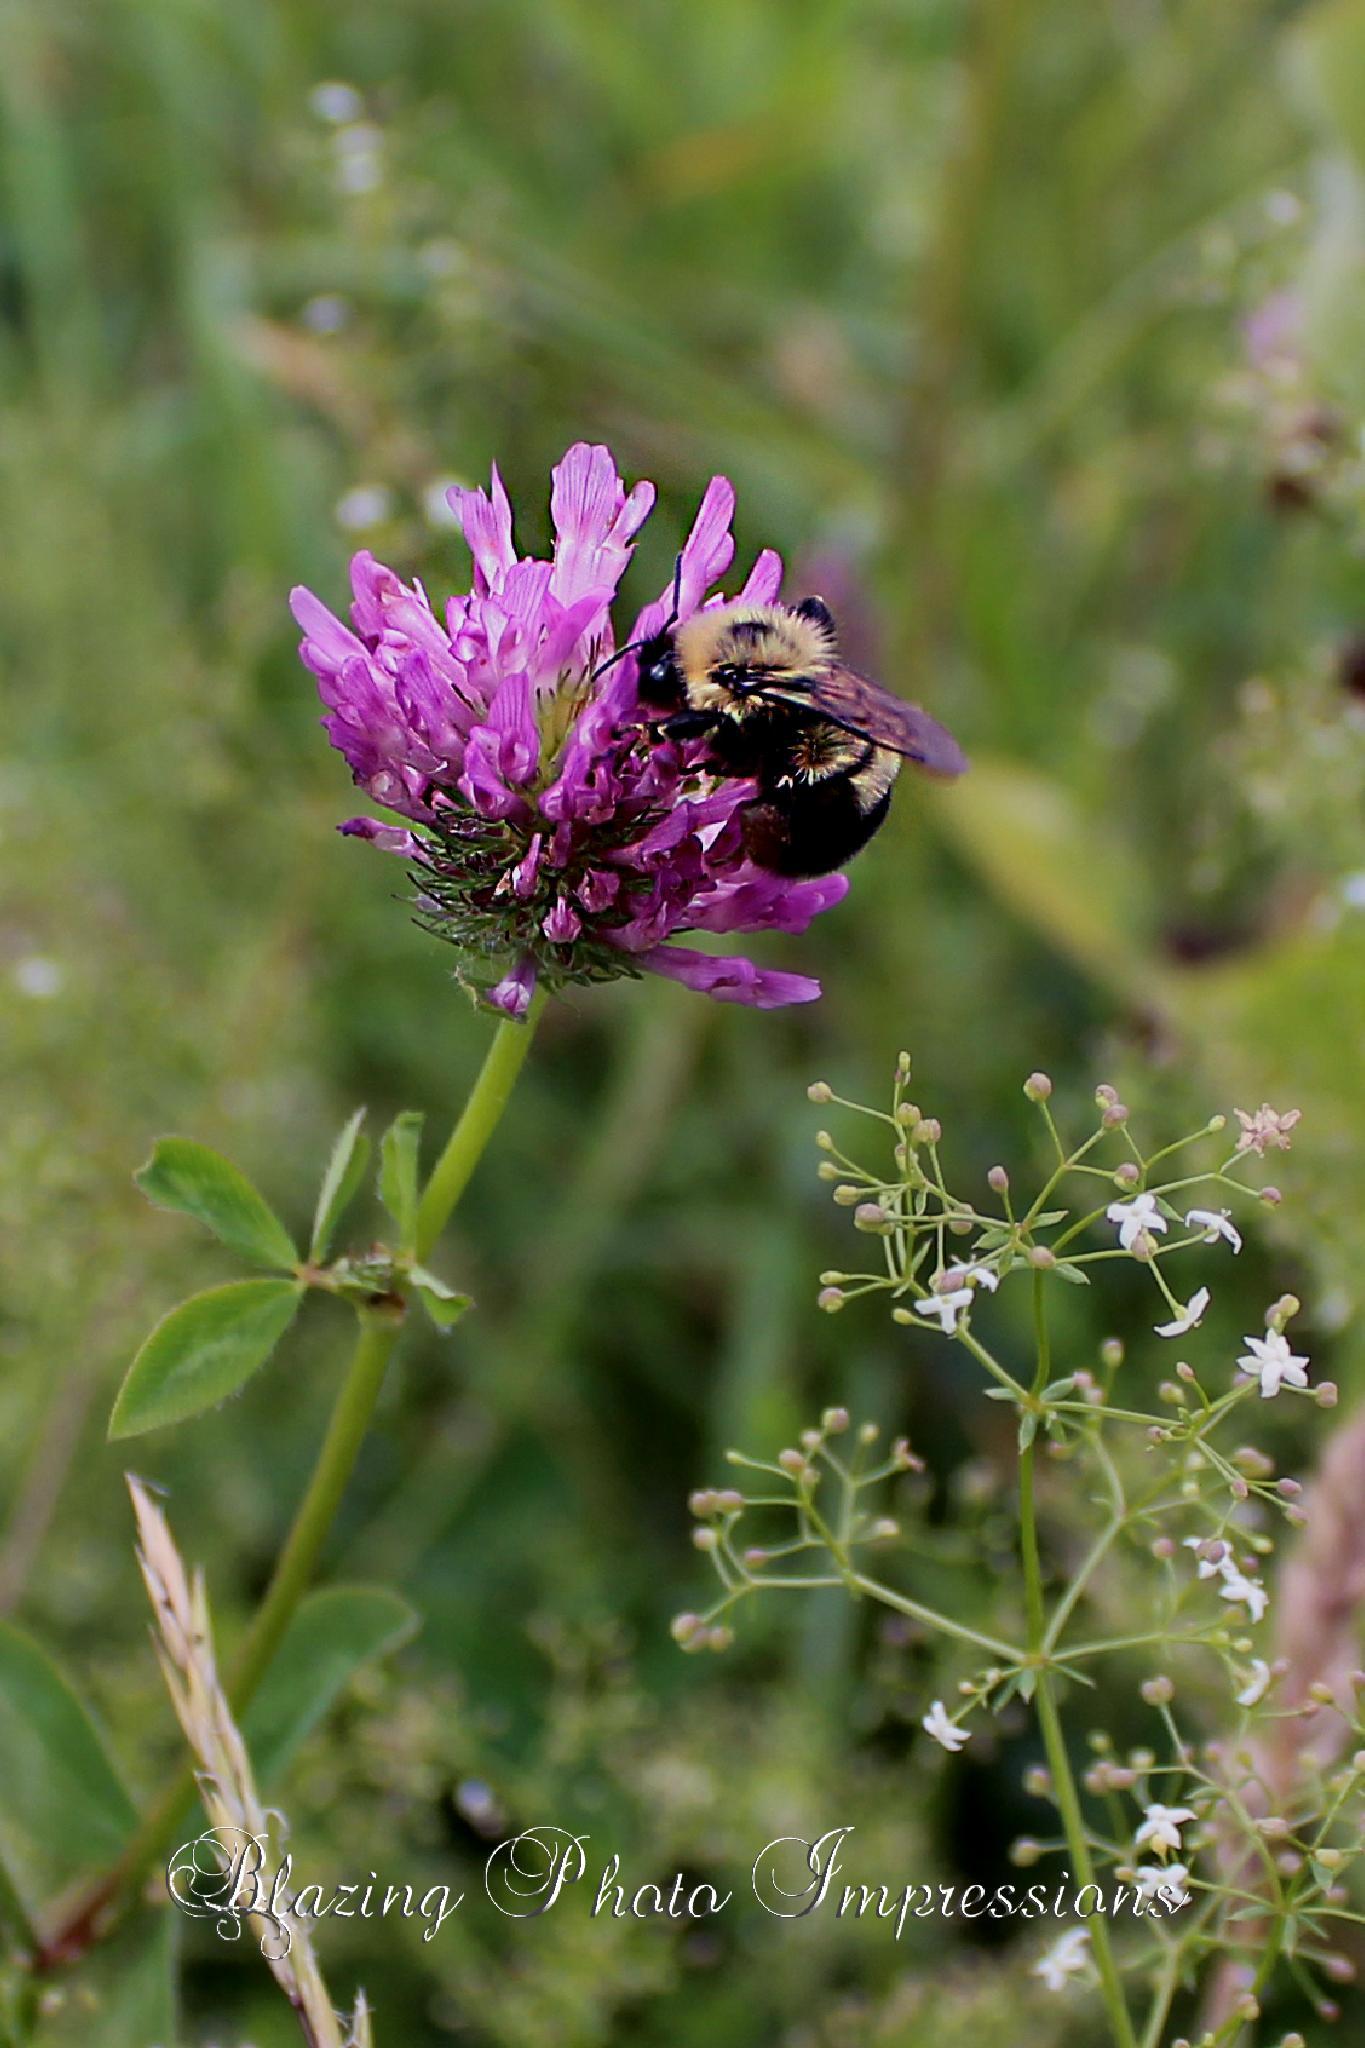 Bumble Bee Bliss by Nanehi Moon